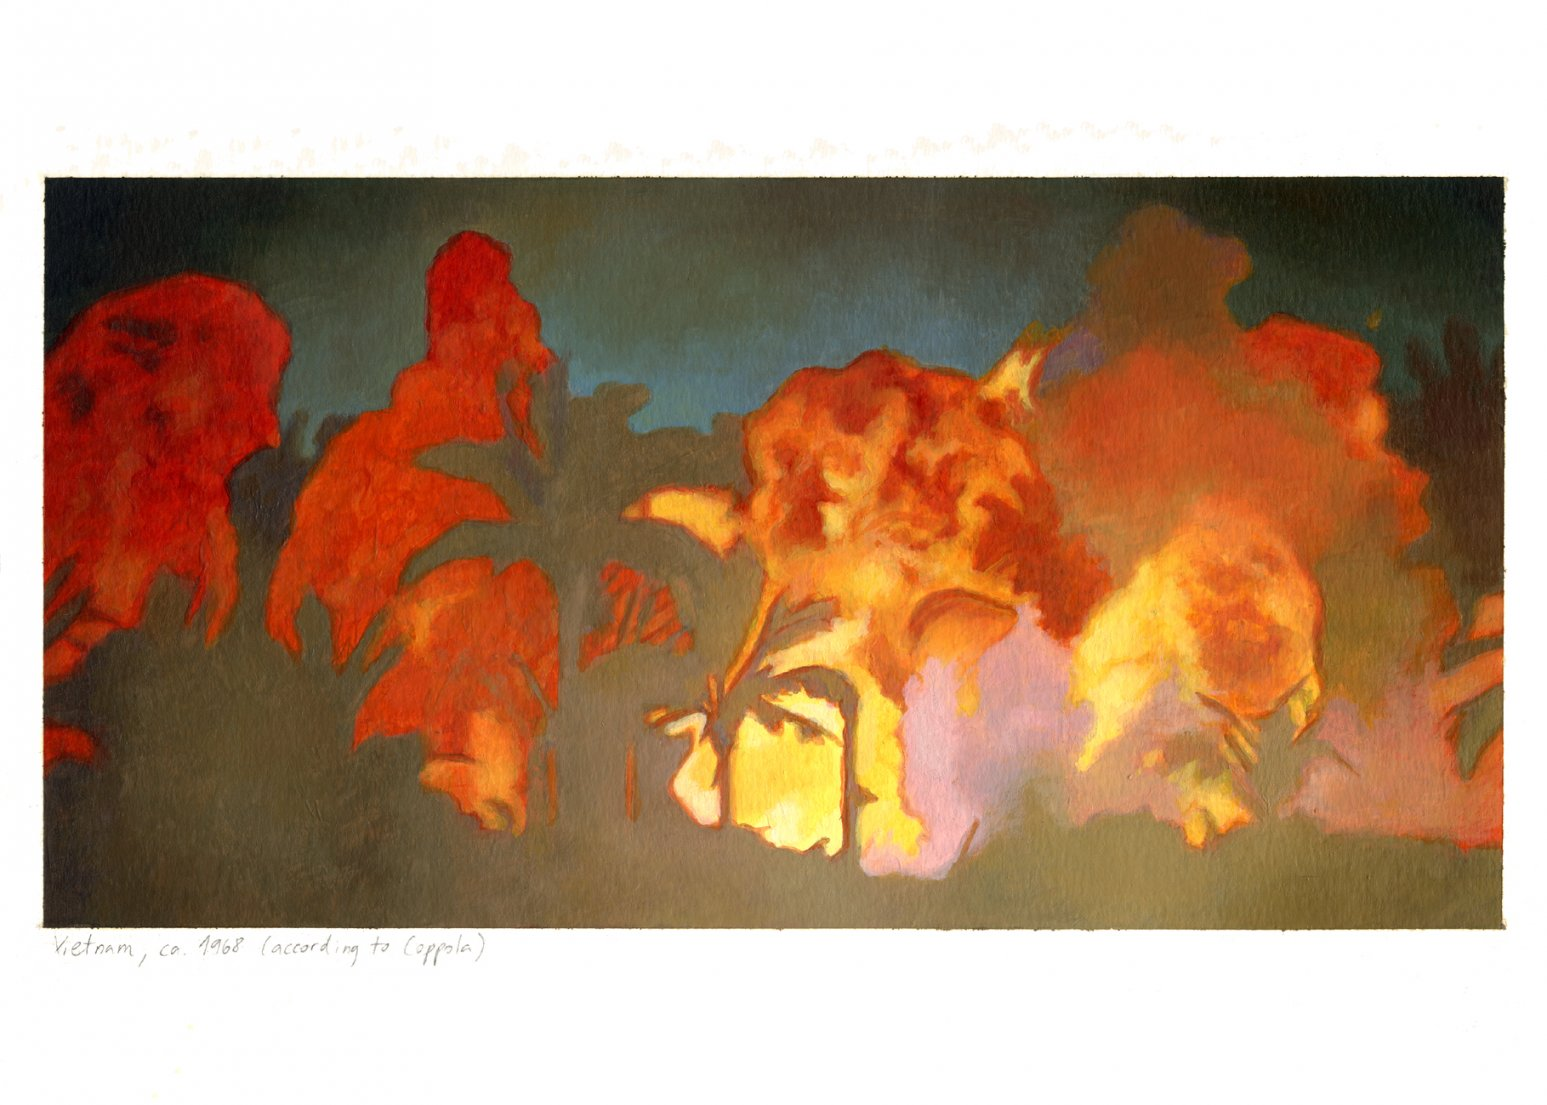 Vietnam, ca. 1968 (according to Coppola), I (2006) - Miguel Aguirre